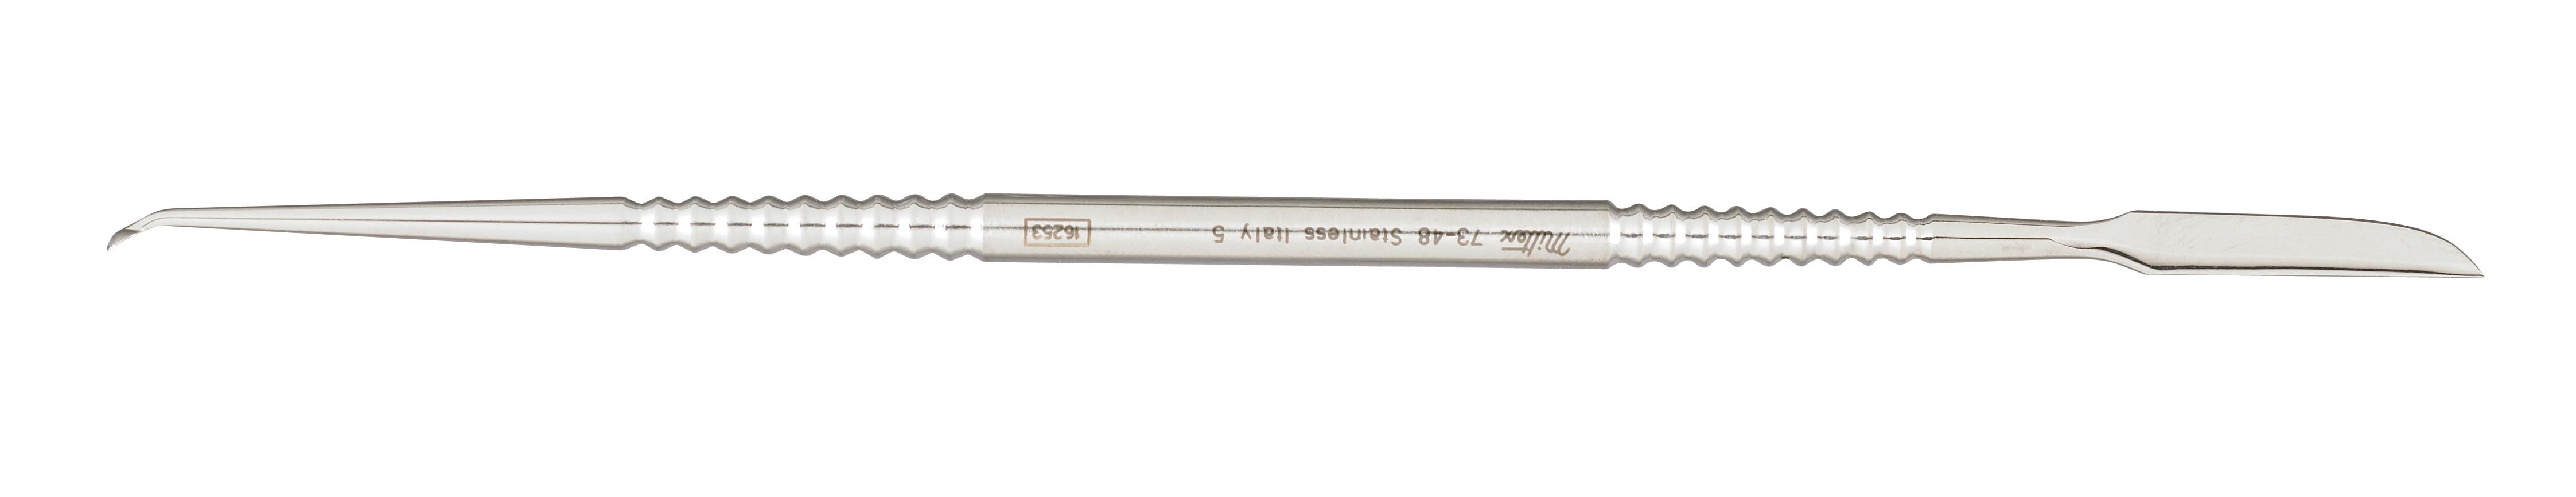 lecron-inlay-carver-73-48-miltex.jpg